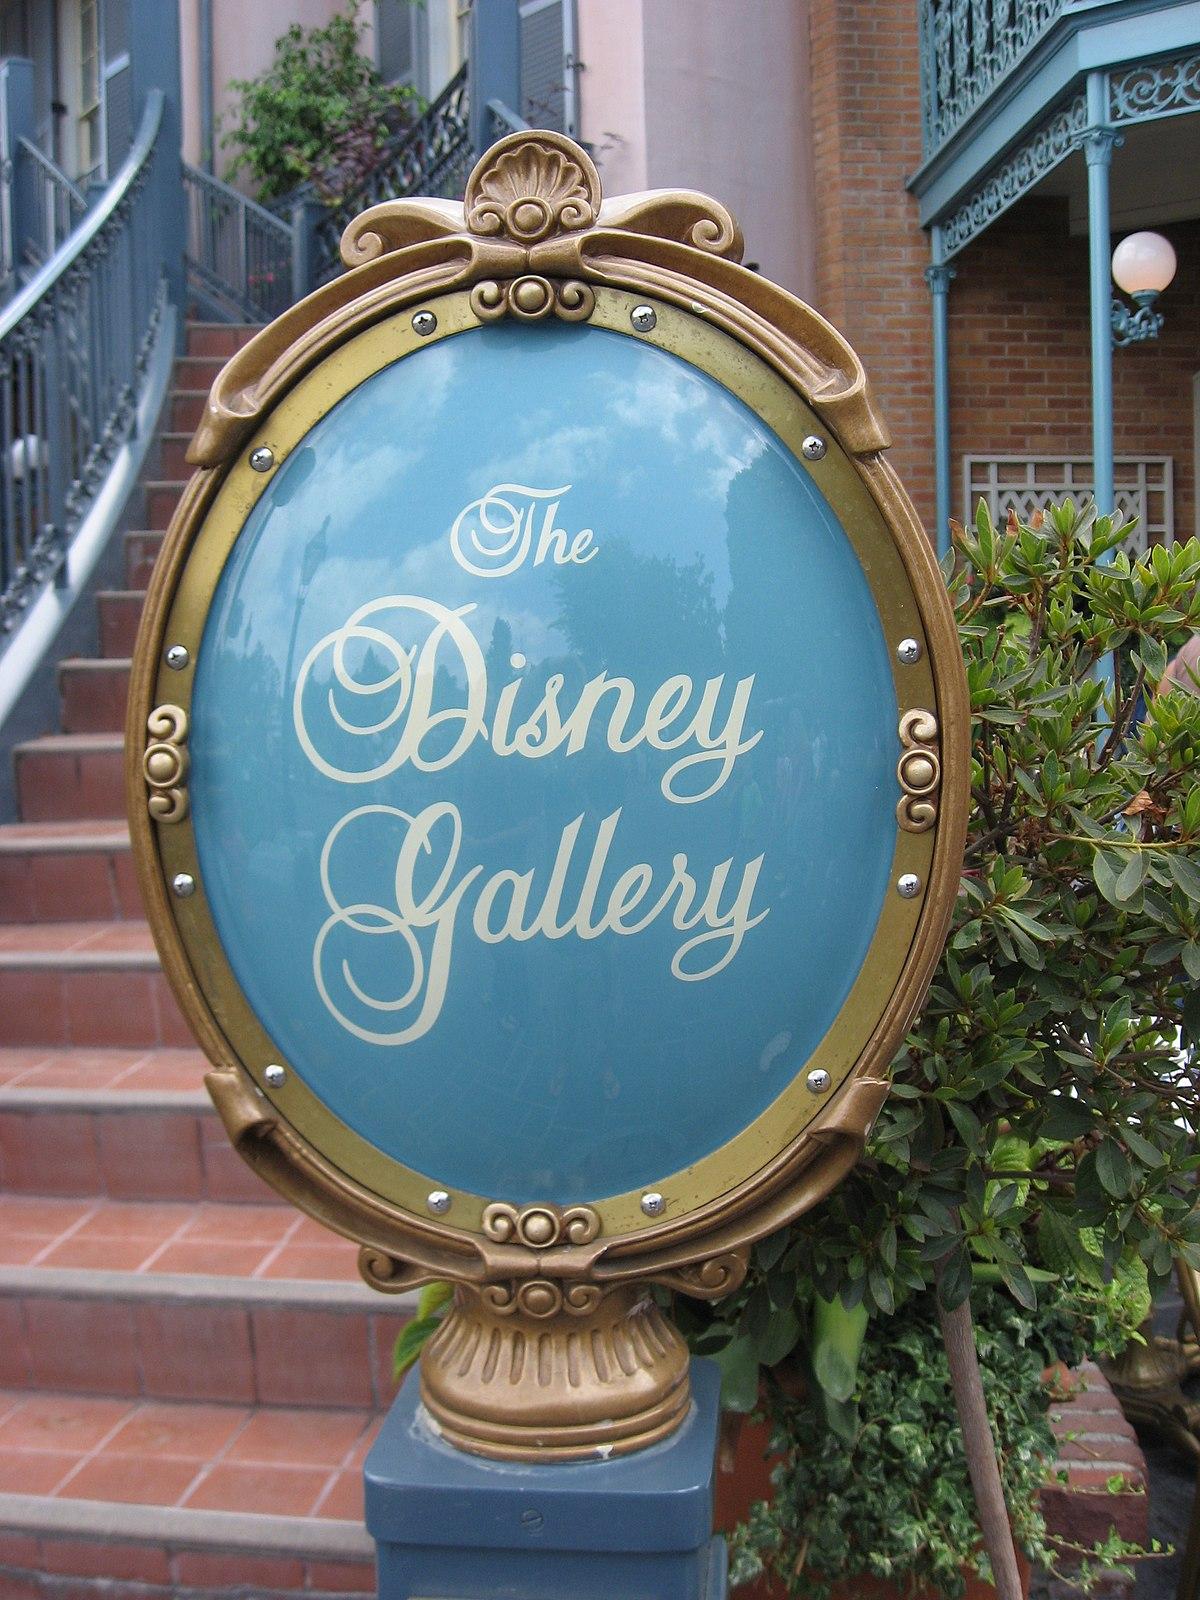 Gallery: The Disney Gallery